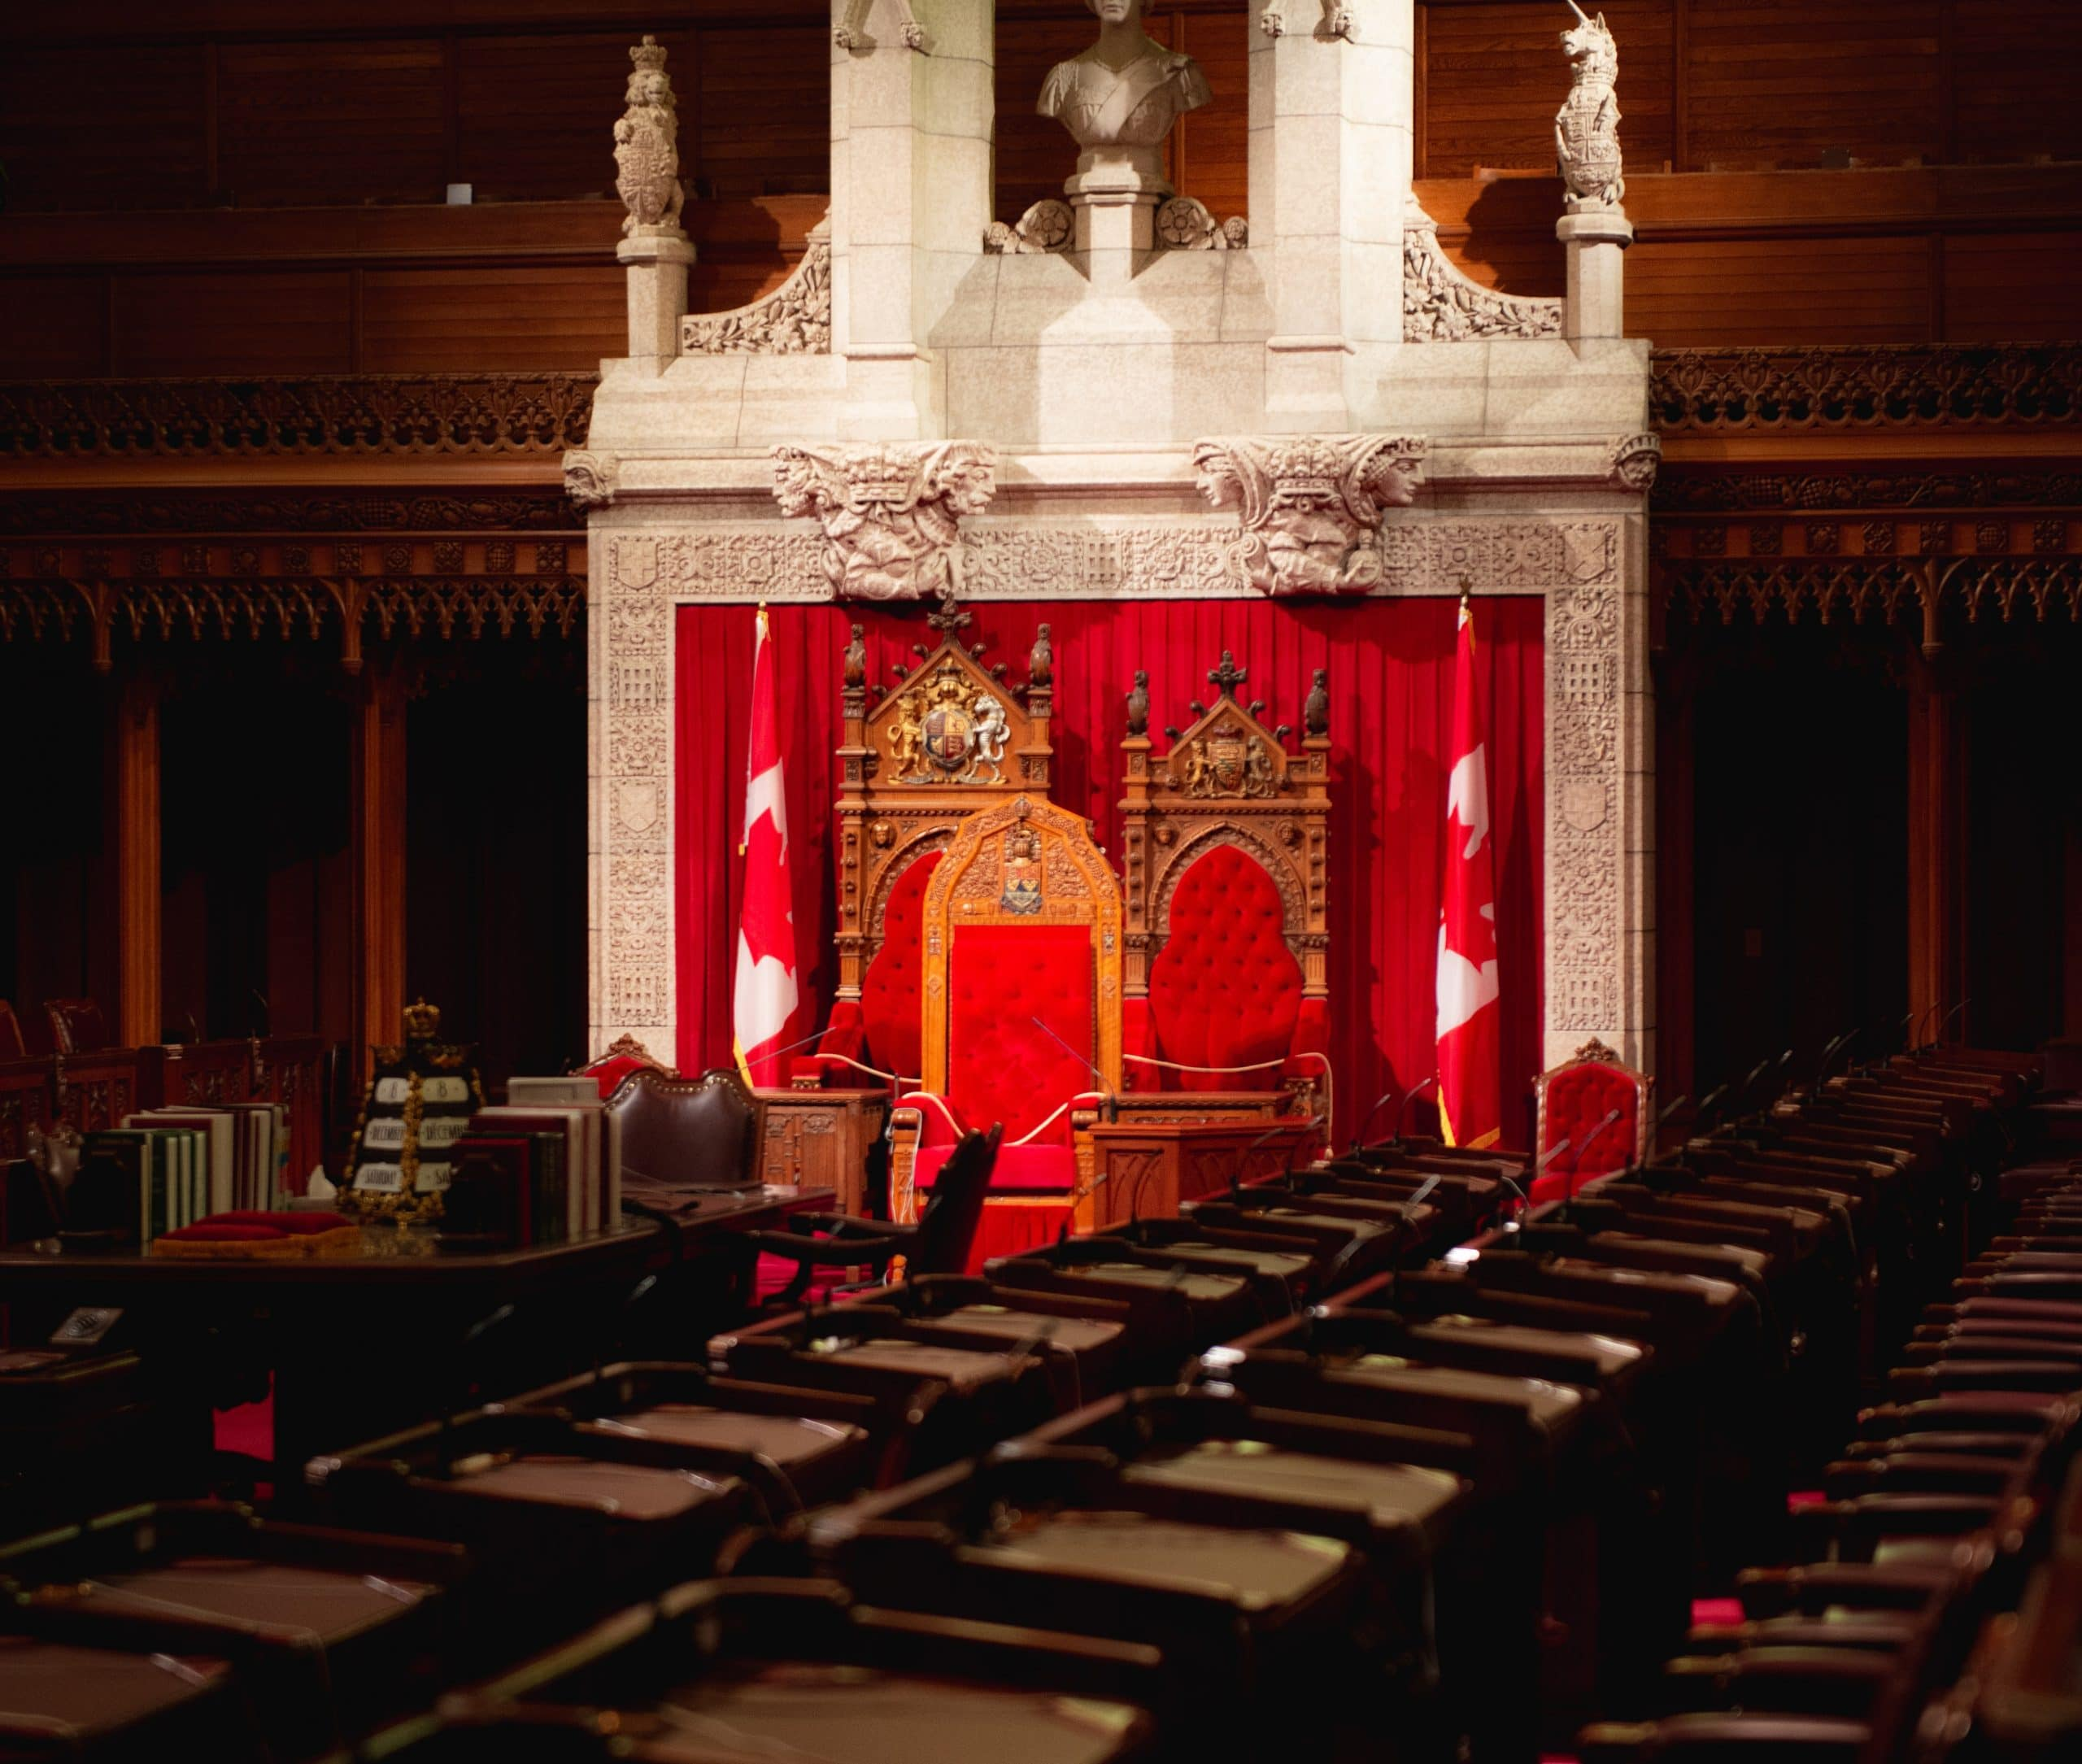 Interior of Parliament in Ottawa